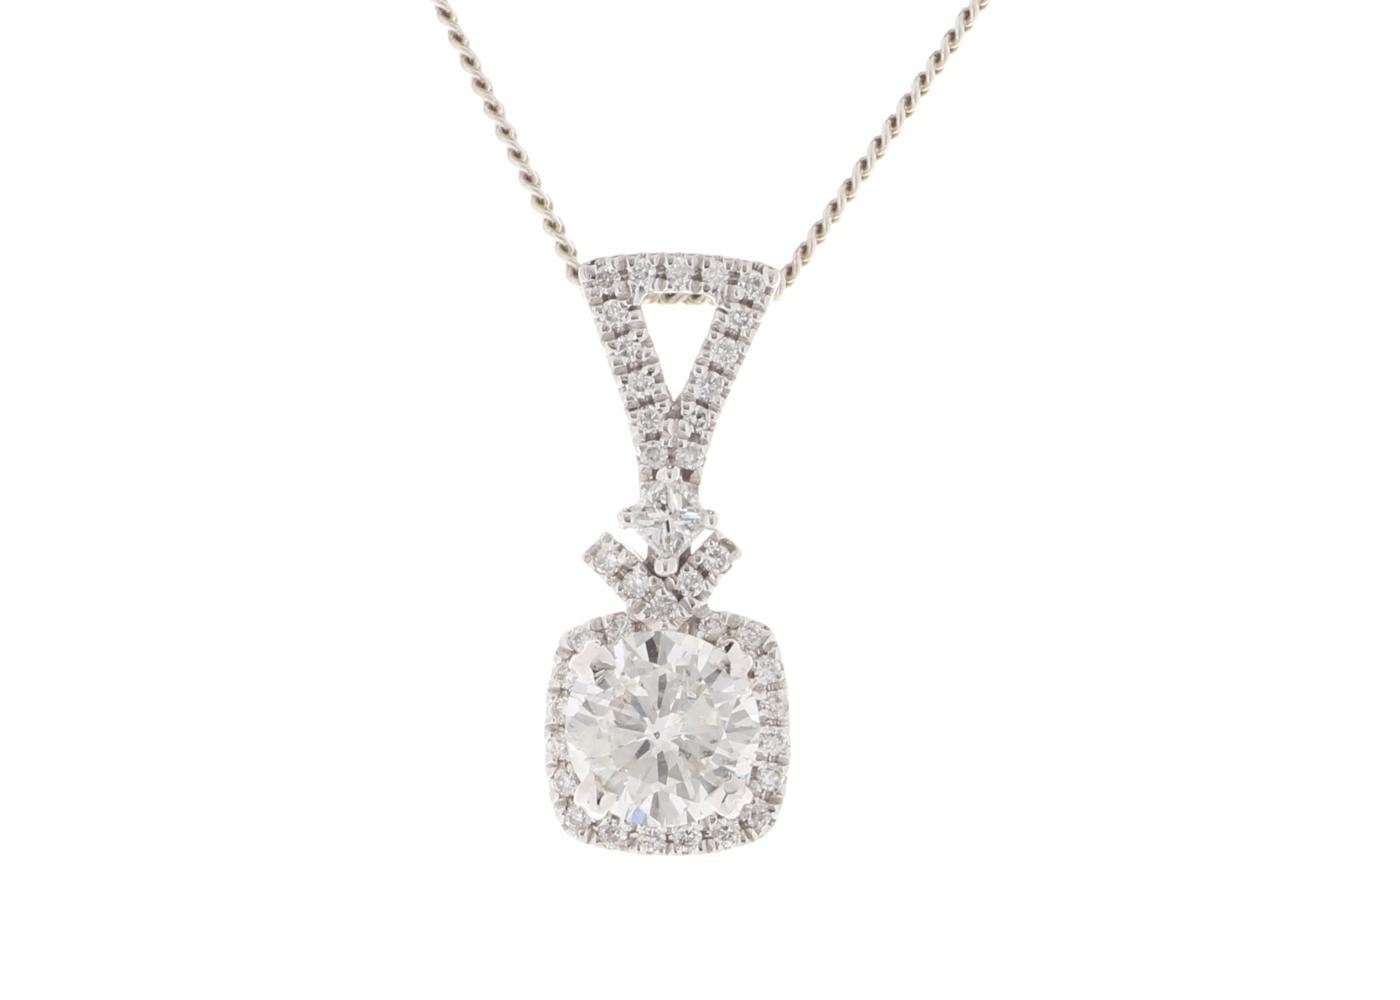 Lot 37 - 18ct White Gold Single Stone cushion Cut Diamond Pendant (0.51) 0.63 Carats